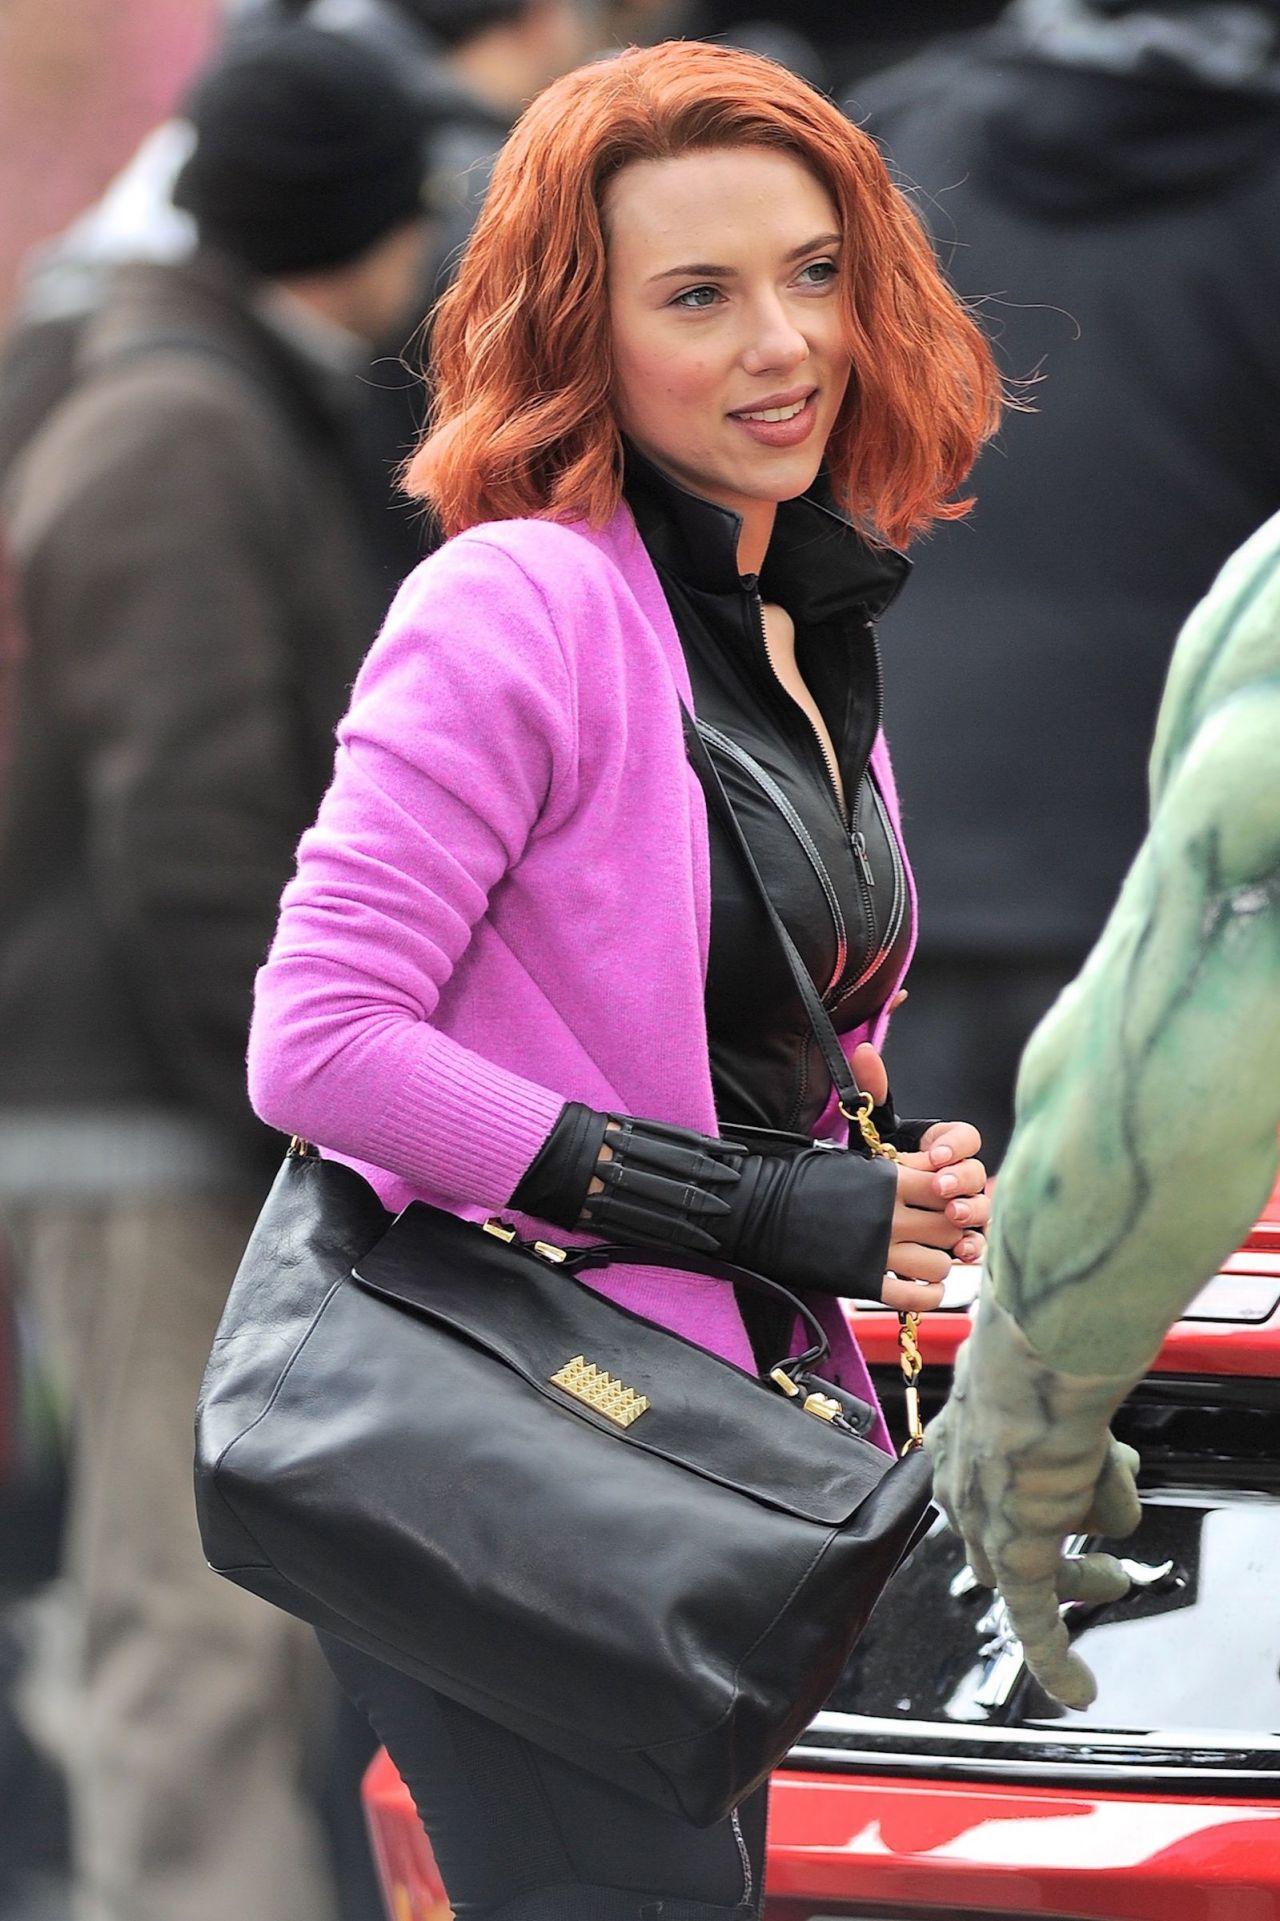 Scarlett Johansson - Filming Scenes For Saturday Night